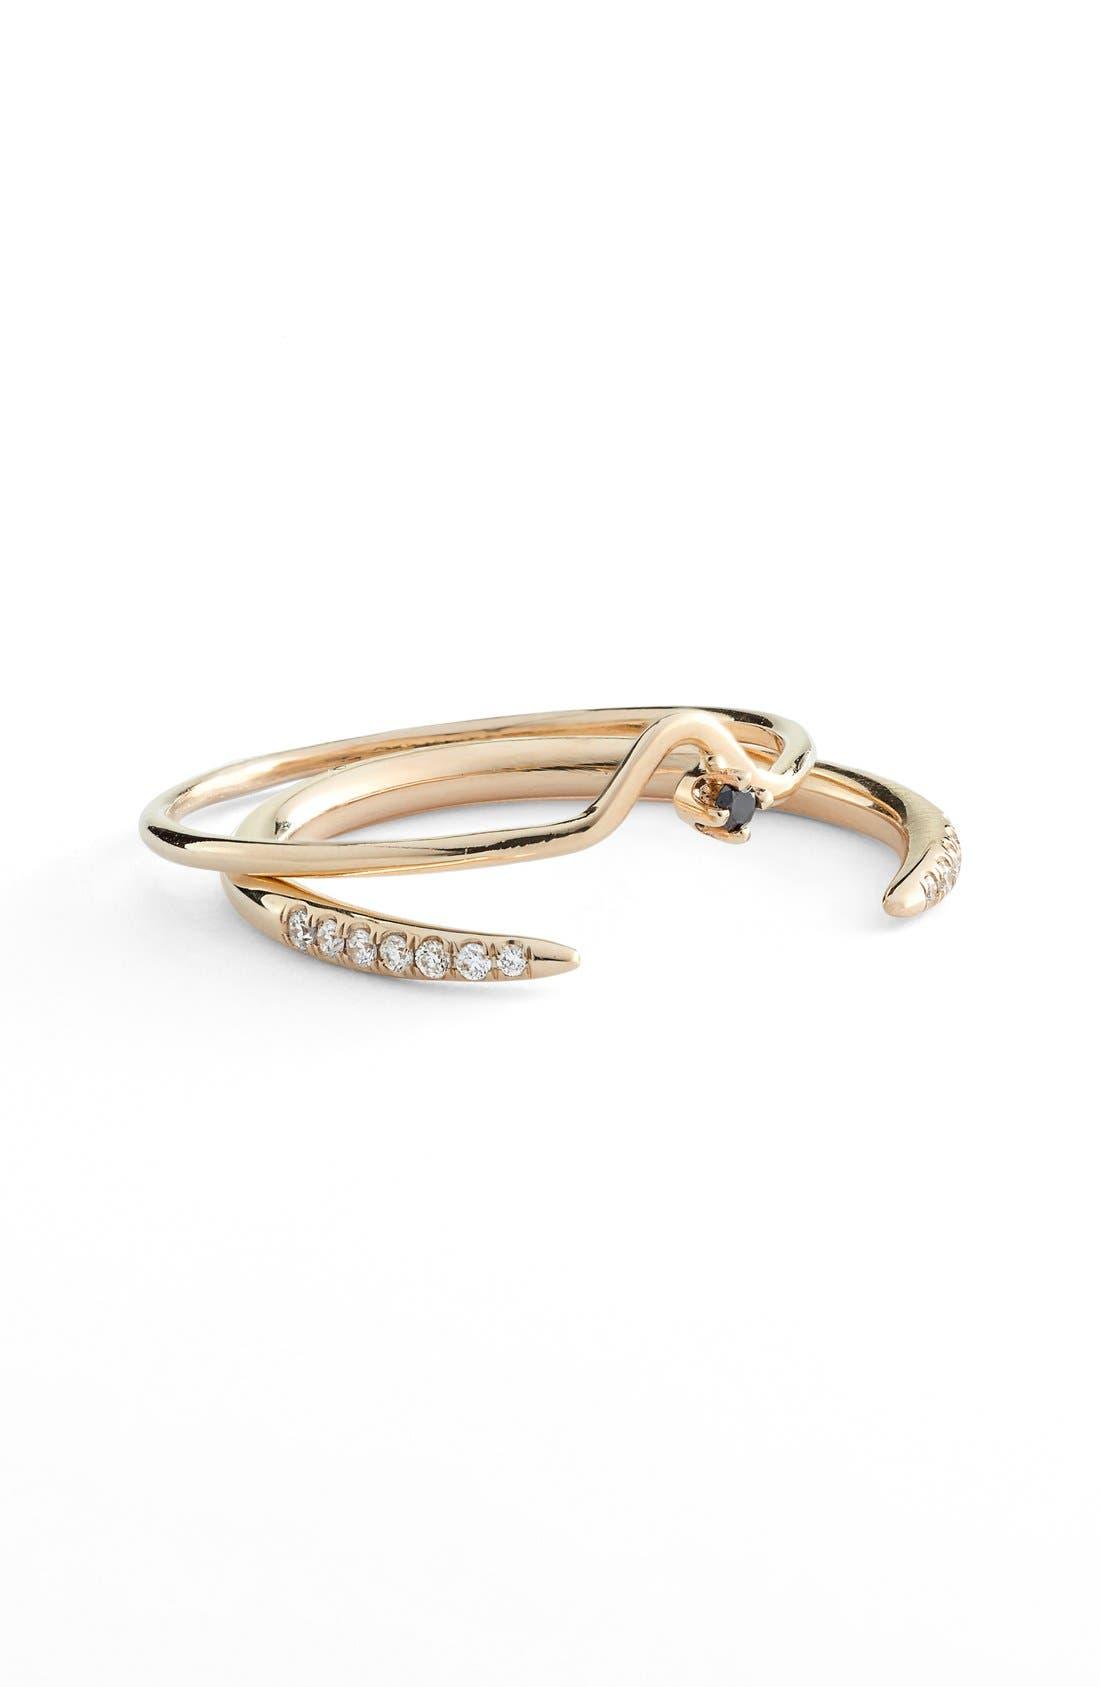 WWAKE 'Micropavé Open Slice' White Diamond Ring & 'Triangle Lineage' Black Diamond Ring (Set of 2)